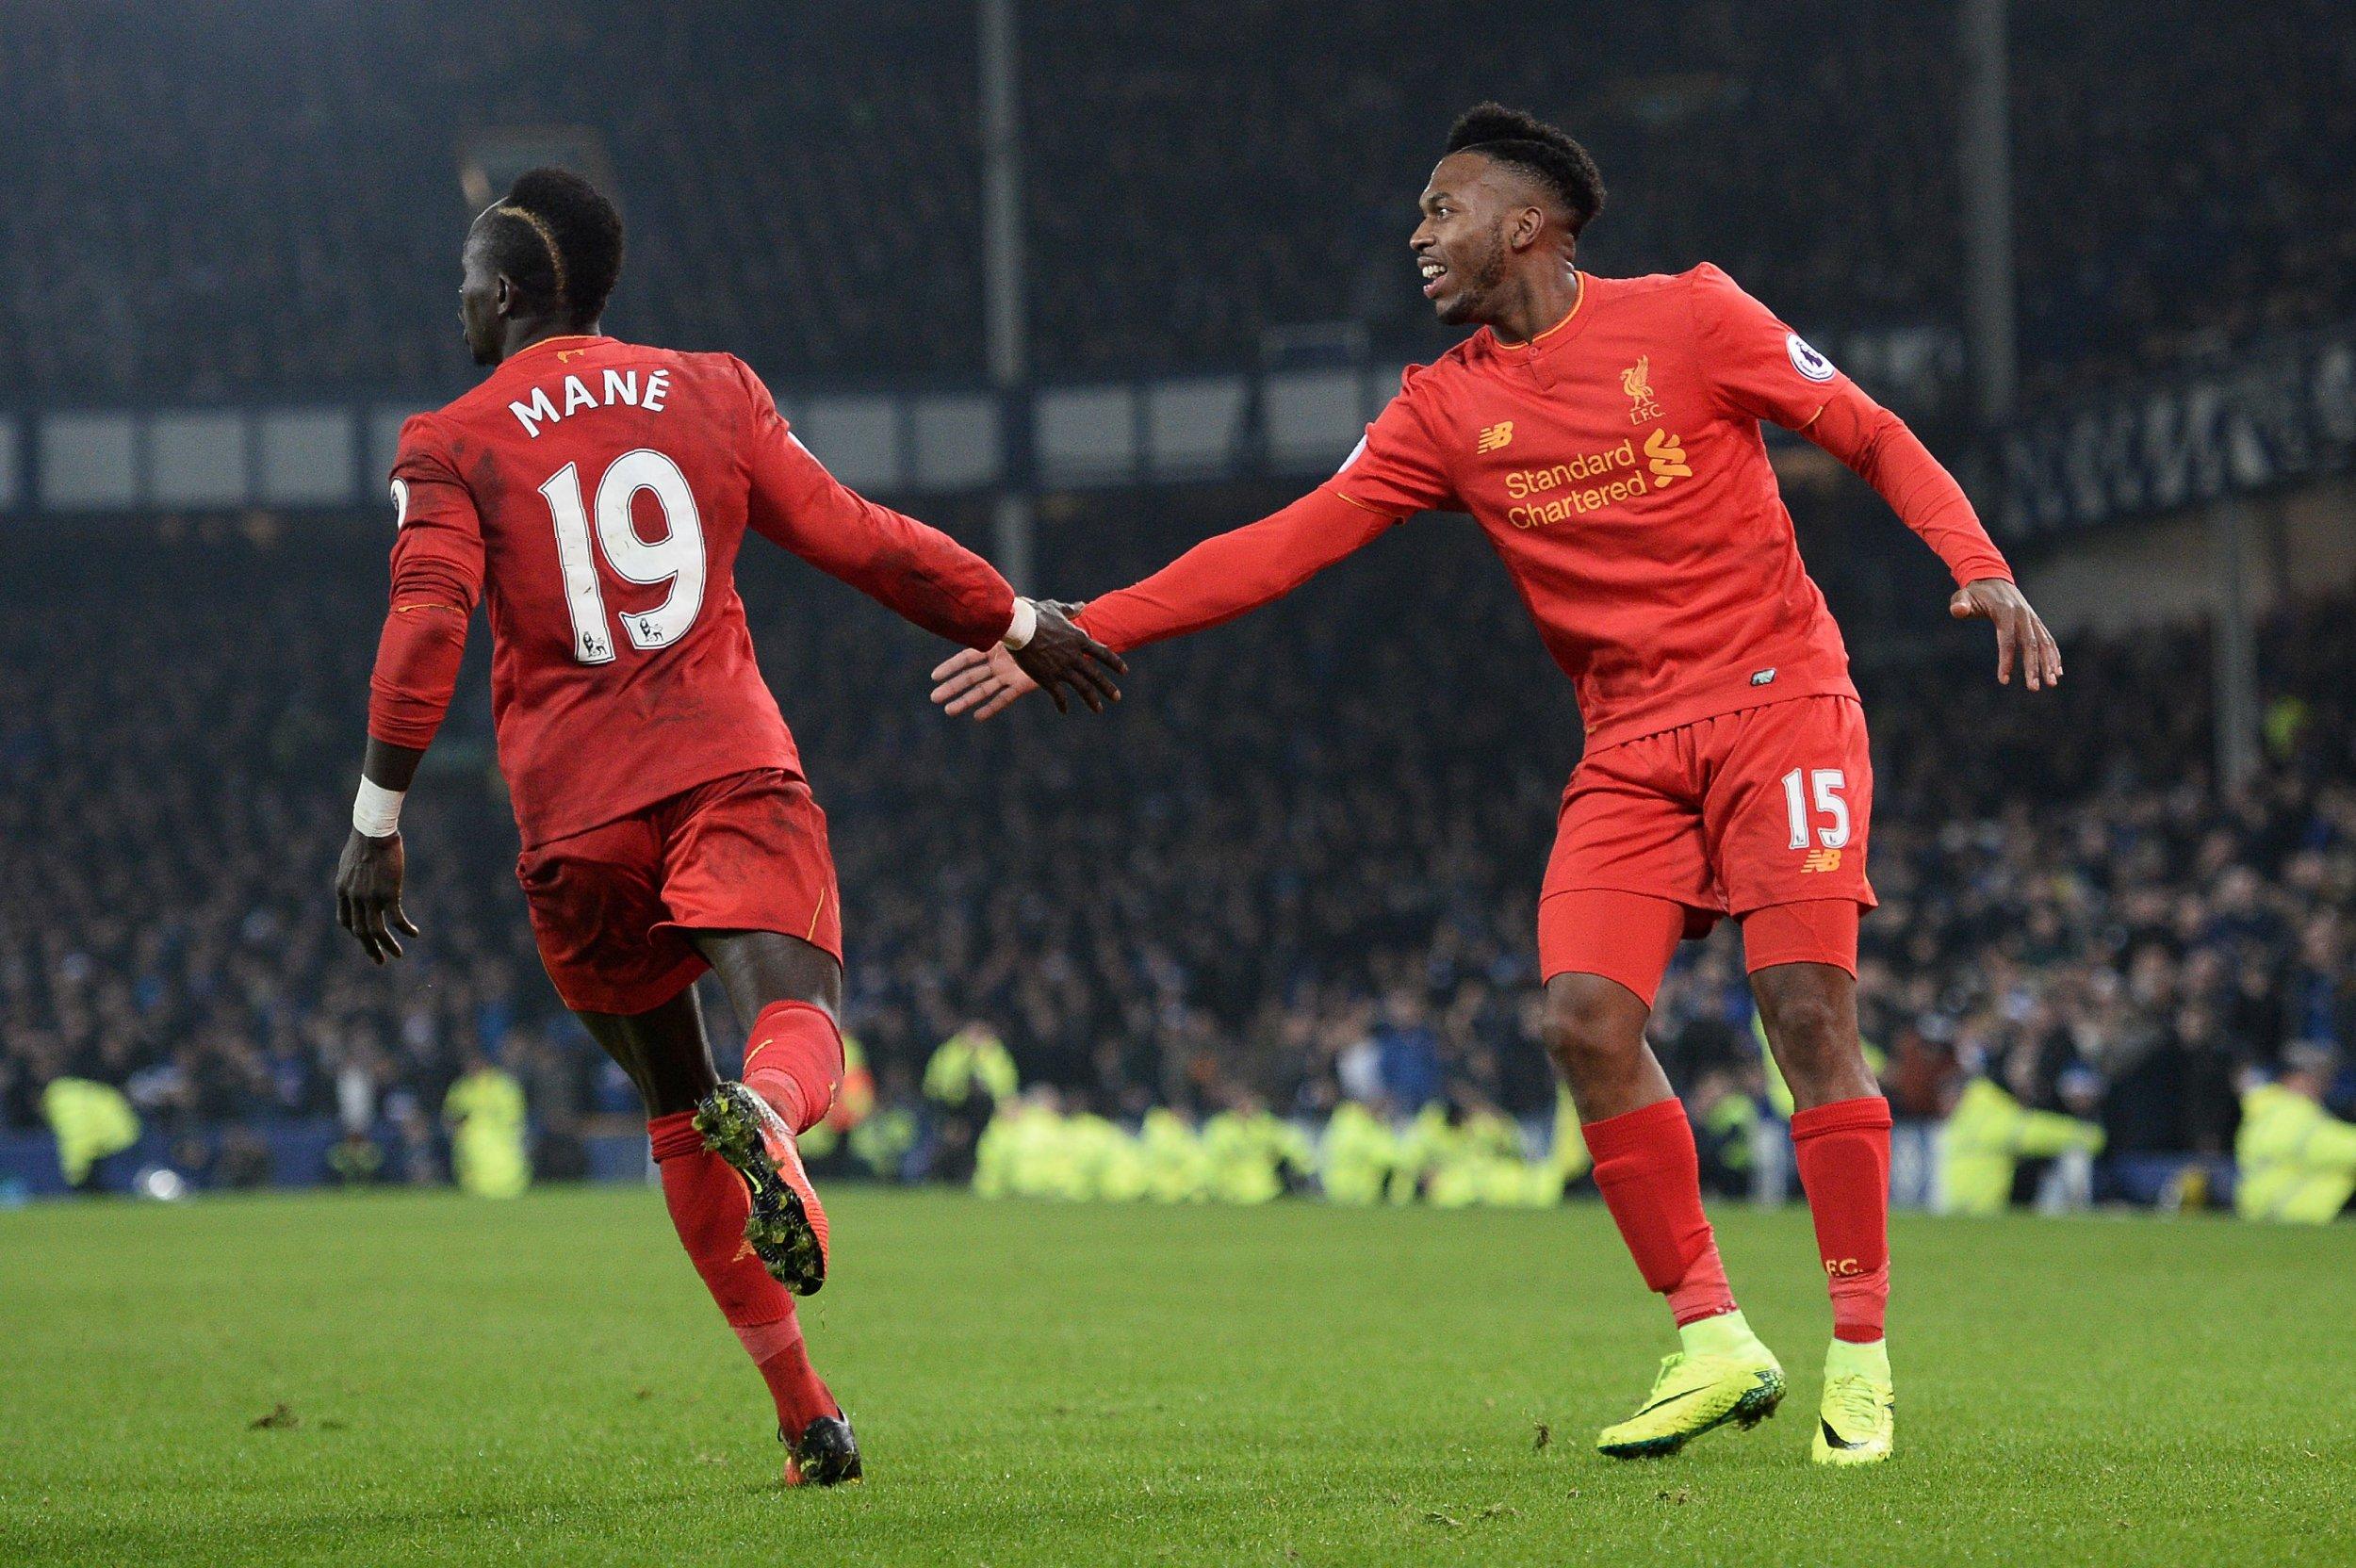 Jurgen Klopp Reveals Impetus Behind Liverpool's Merseyside Derby Victory